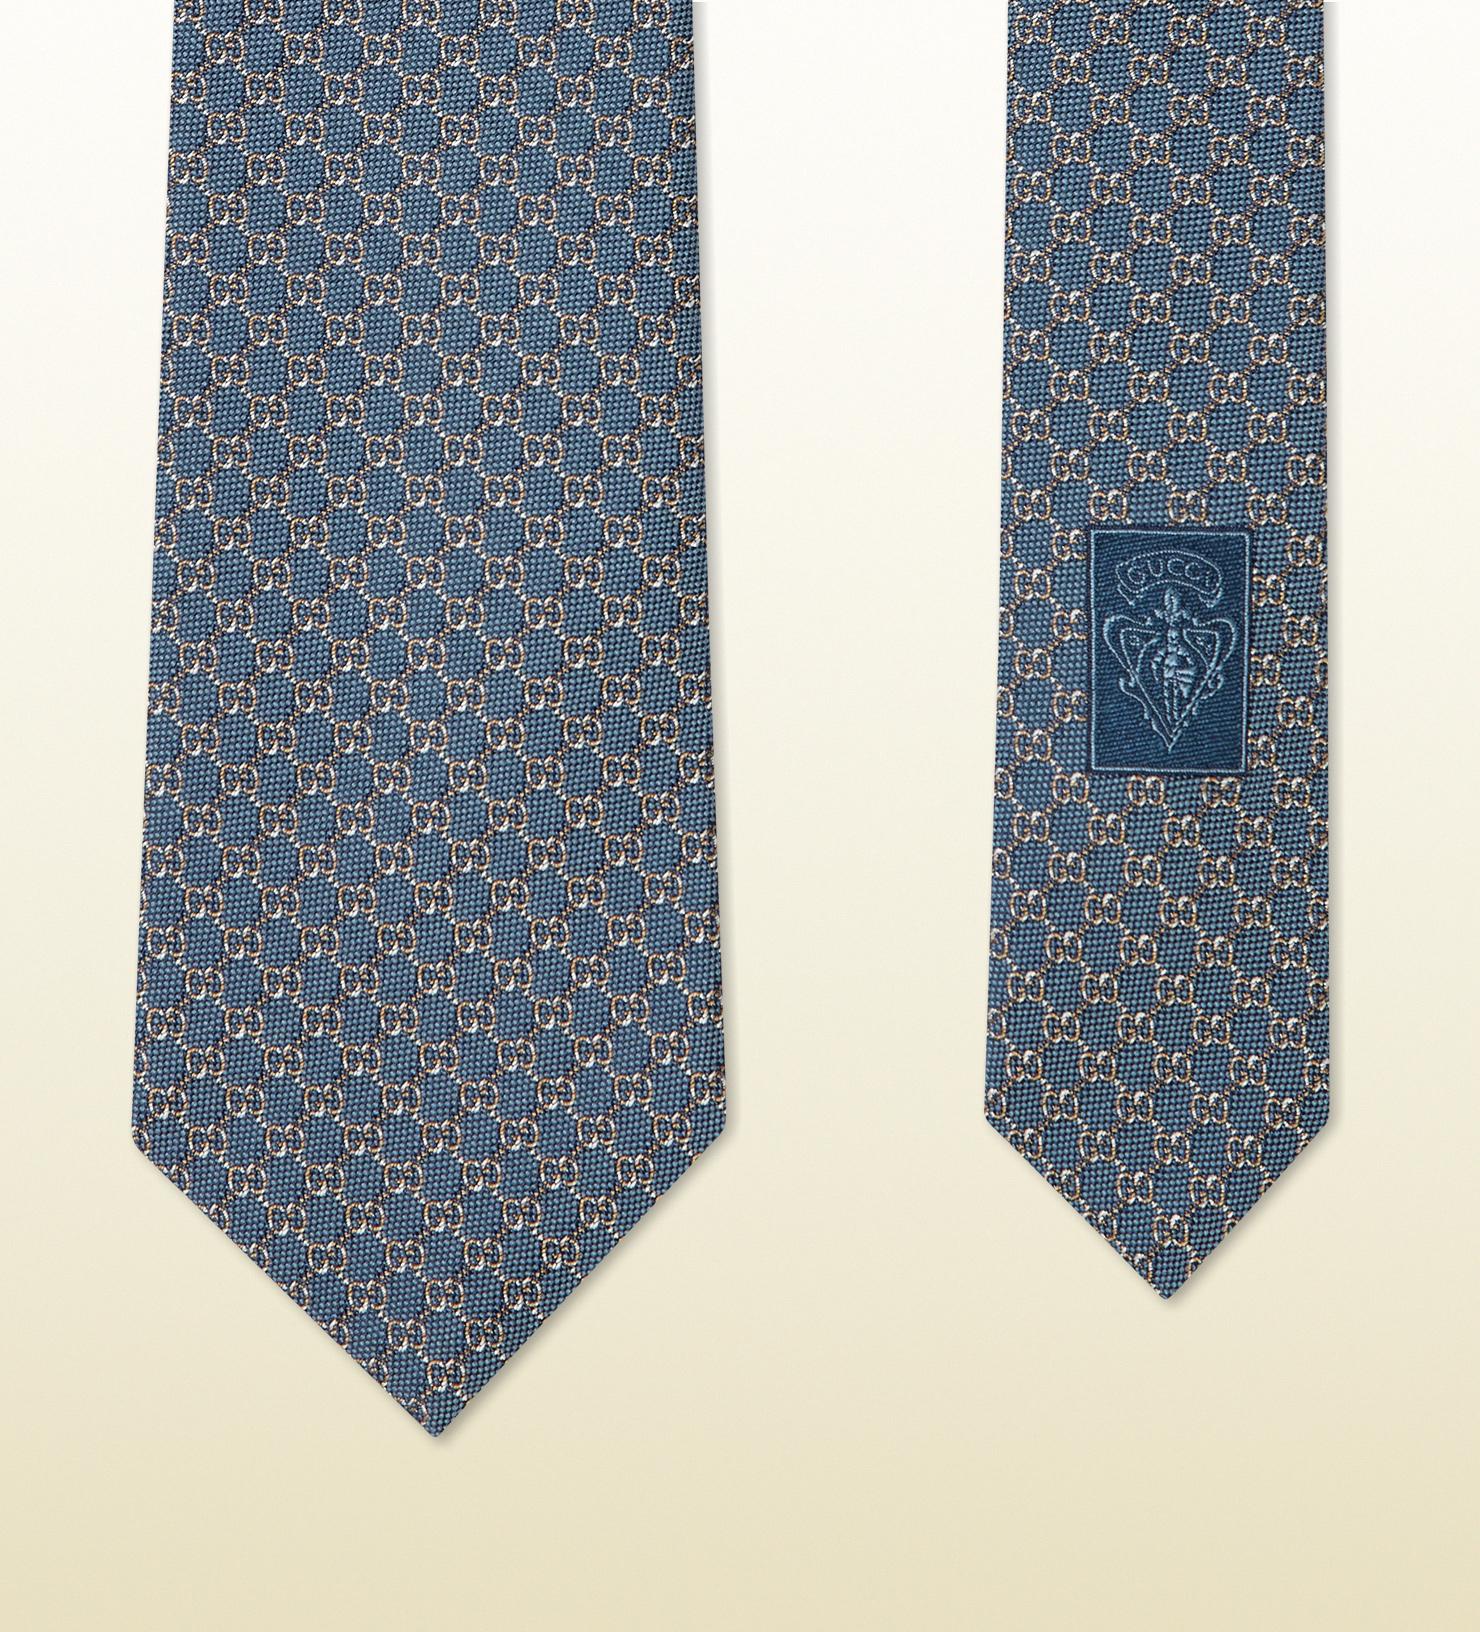 1676849efe9 Lyst - Gucci Gg Pattern Silk Tie in Blue for Men